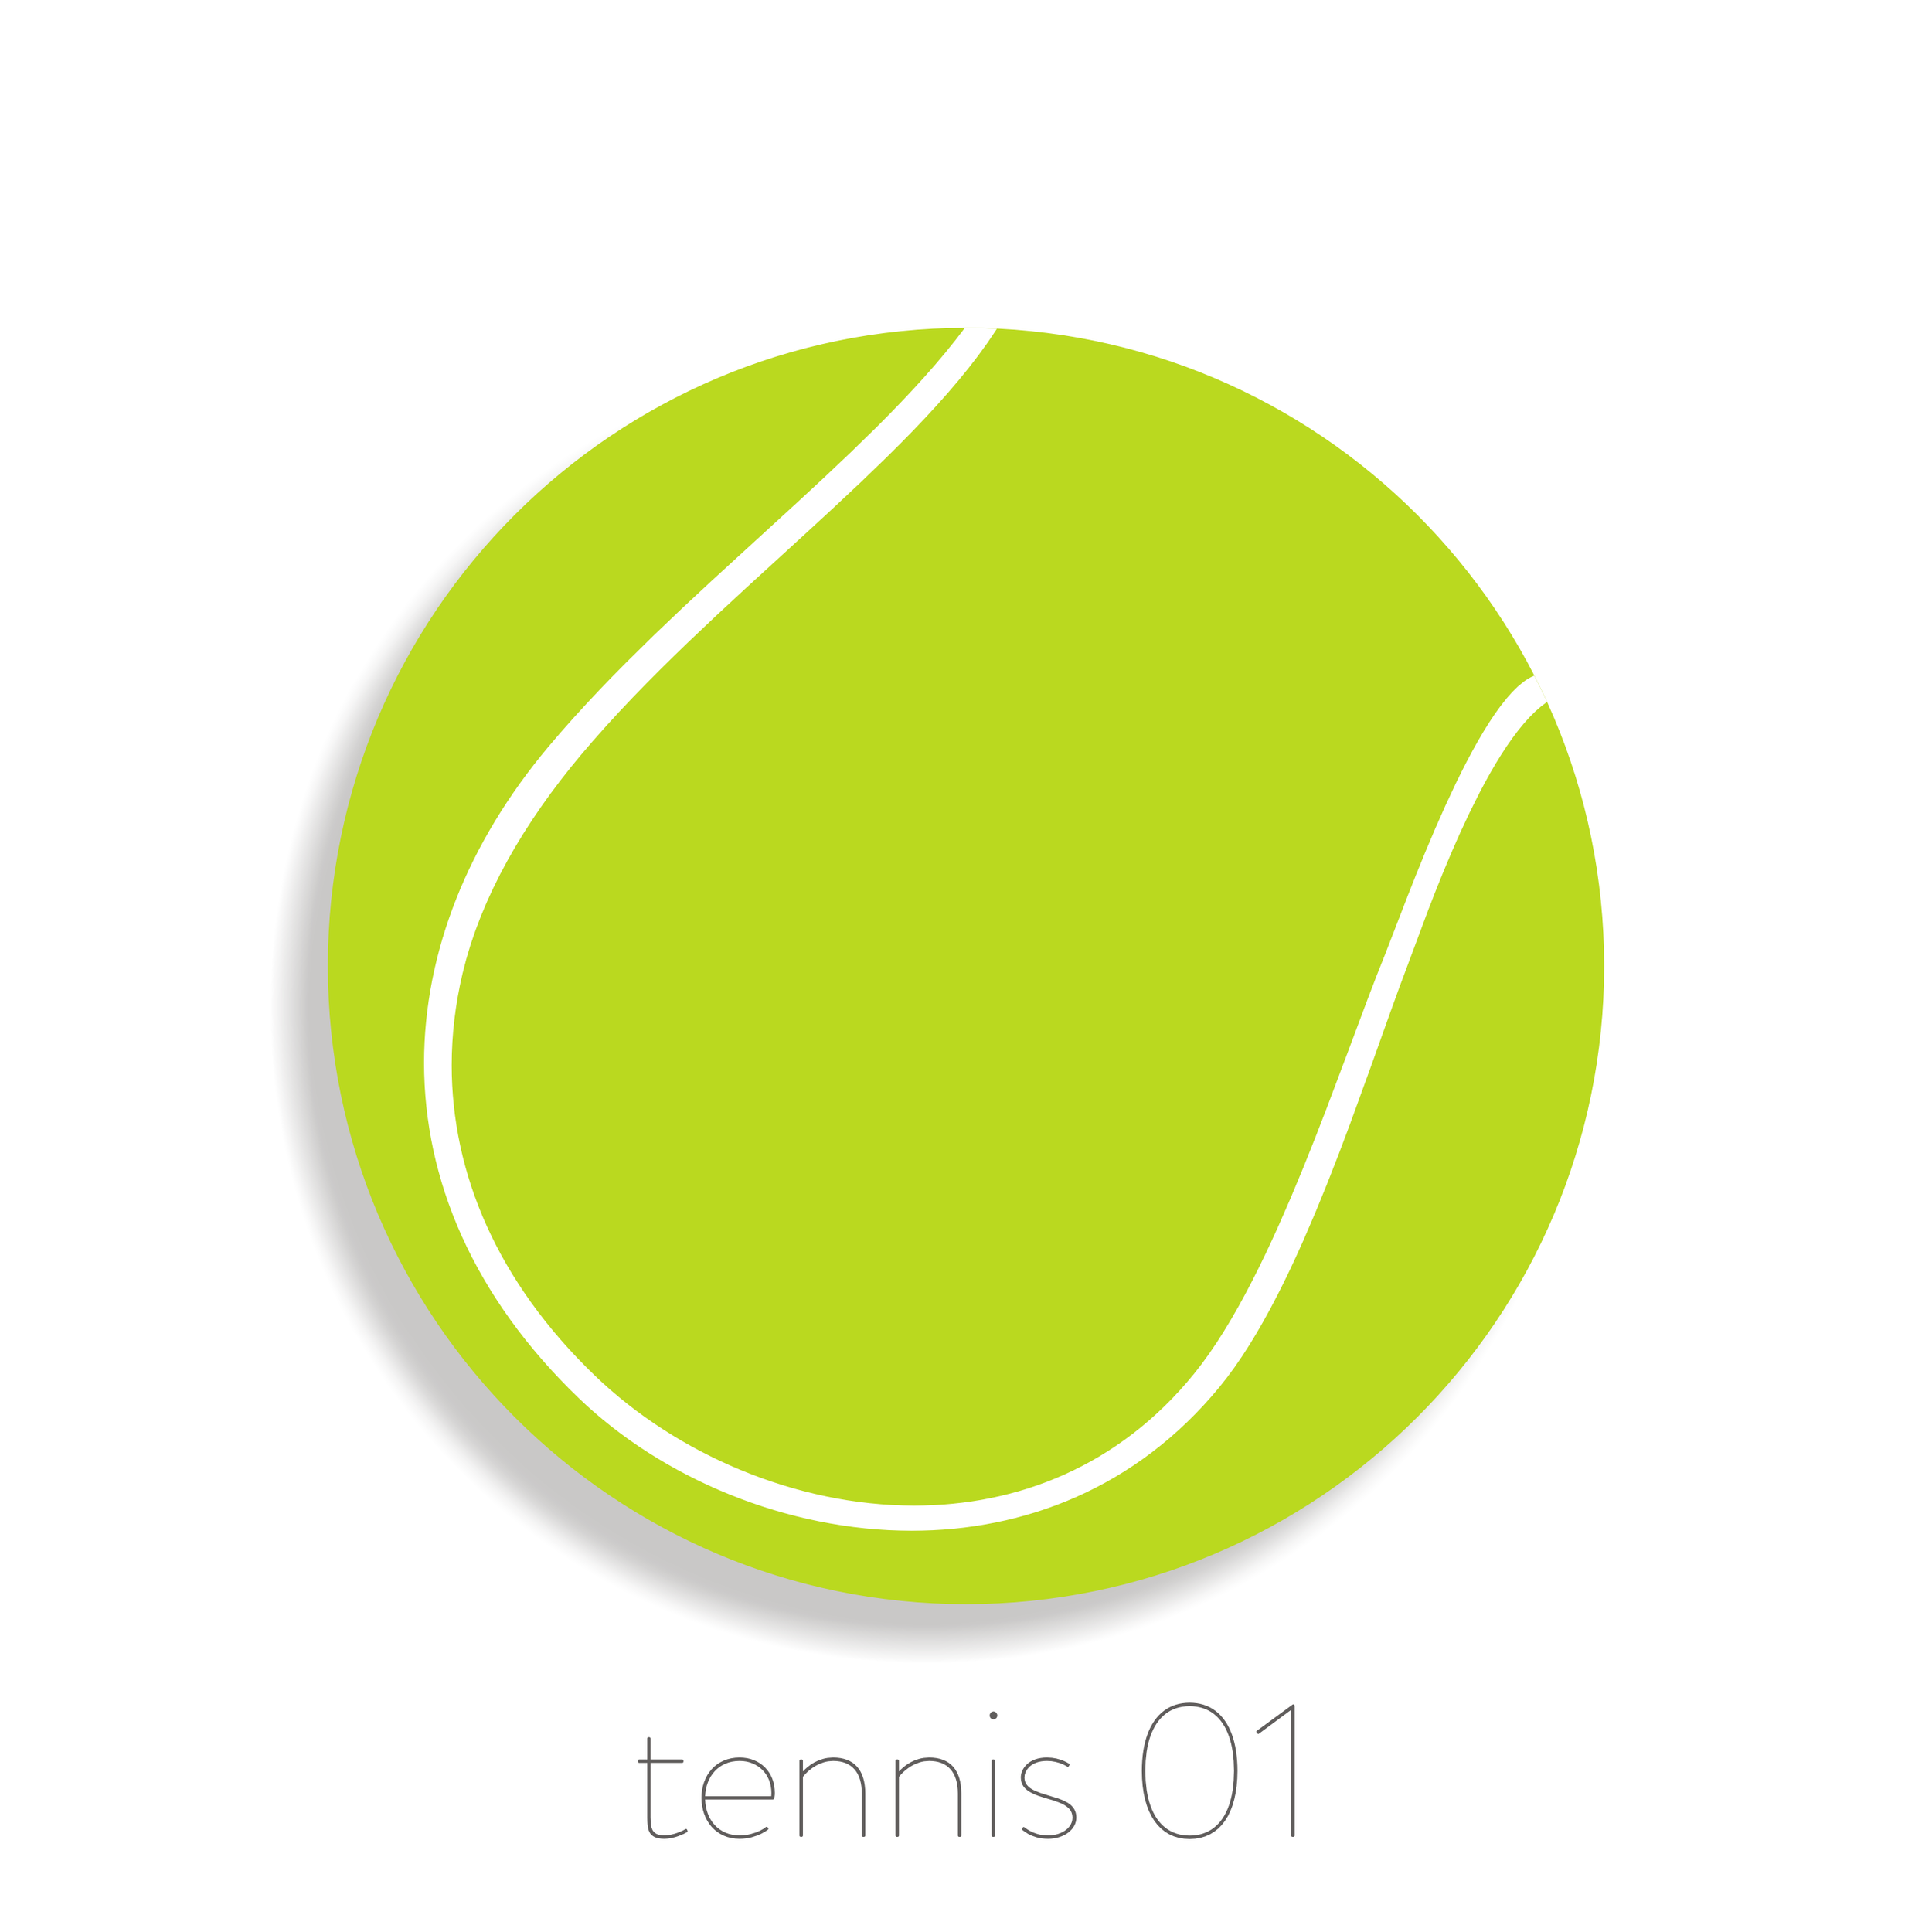 tennis 01.png